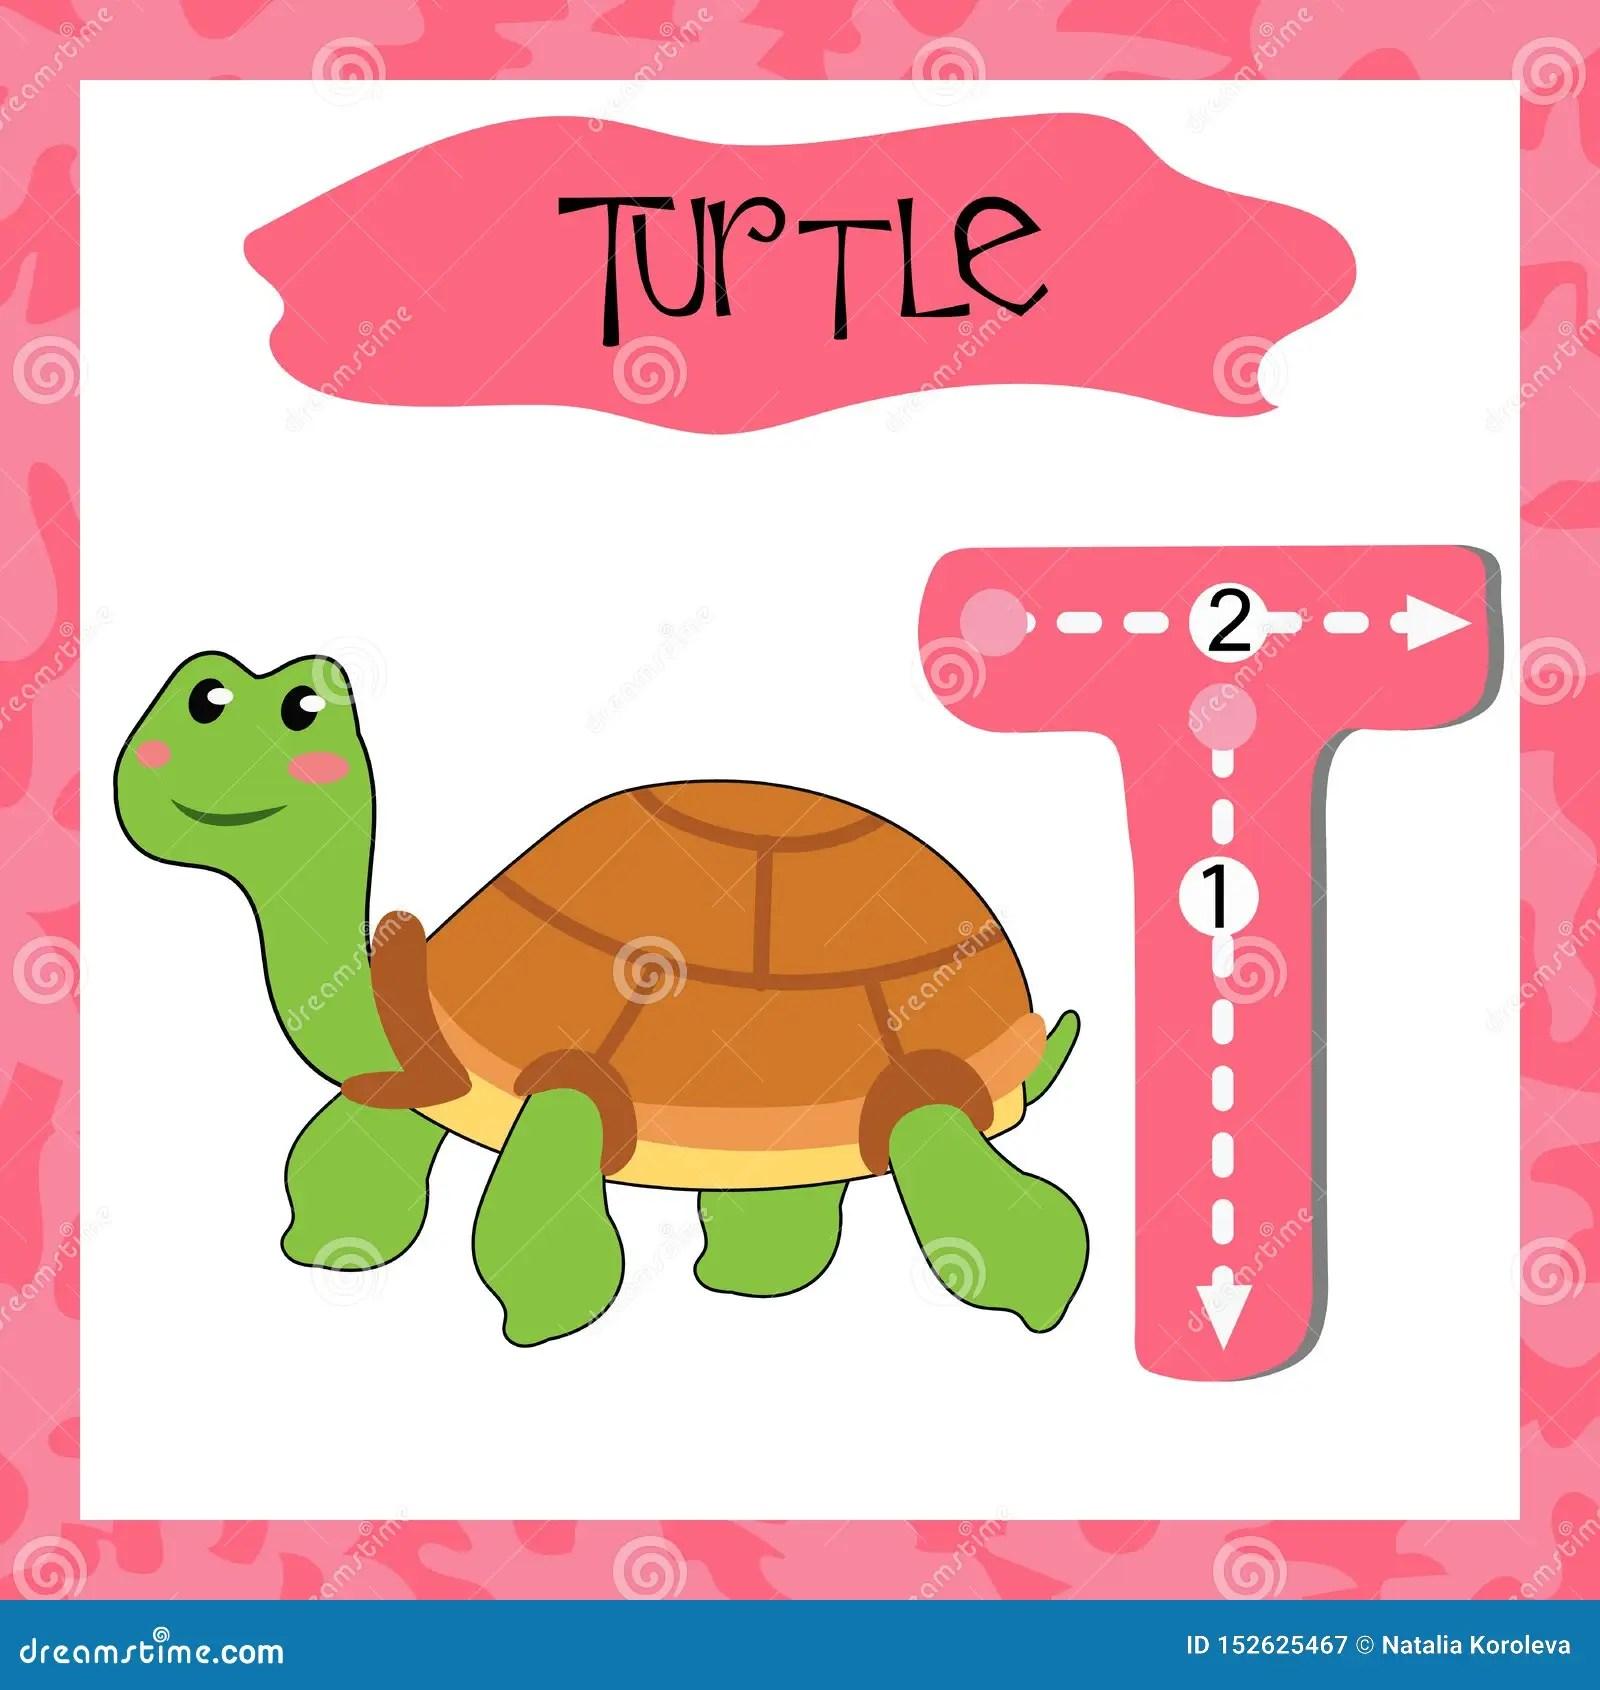 English Alphabet Letter T For Teaching Children To Read